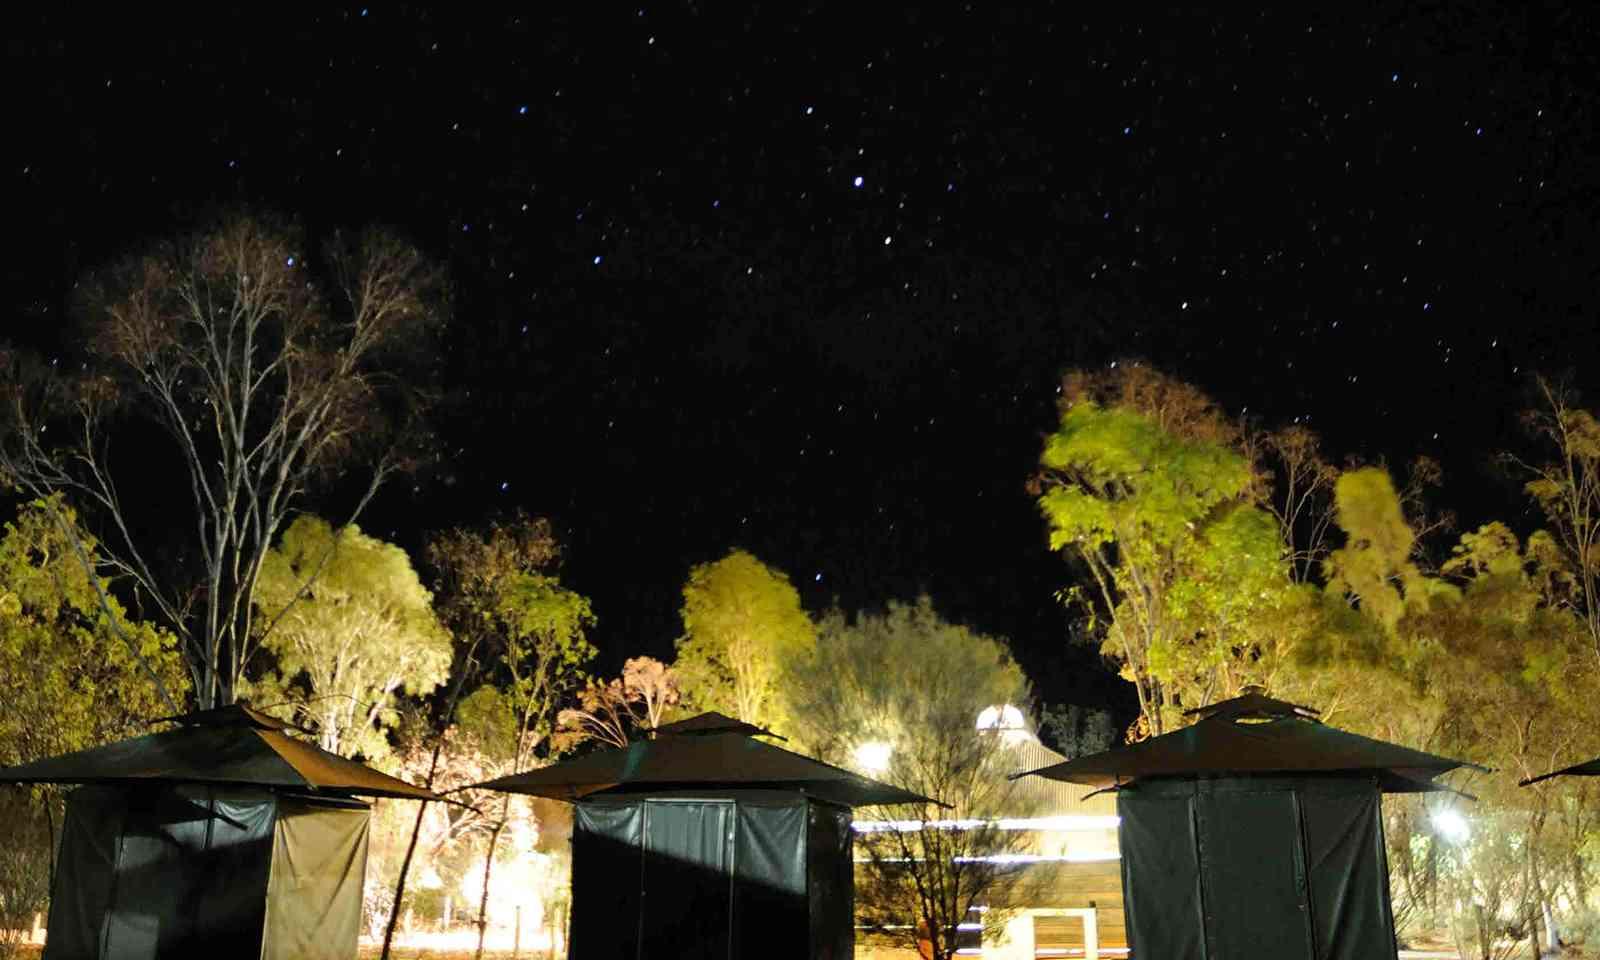 Starry night at Uluru-Kata Tjuta National Park, Australia (Dreamstime)